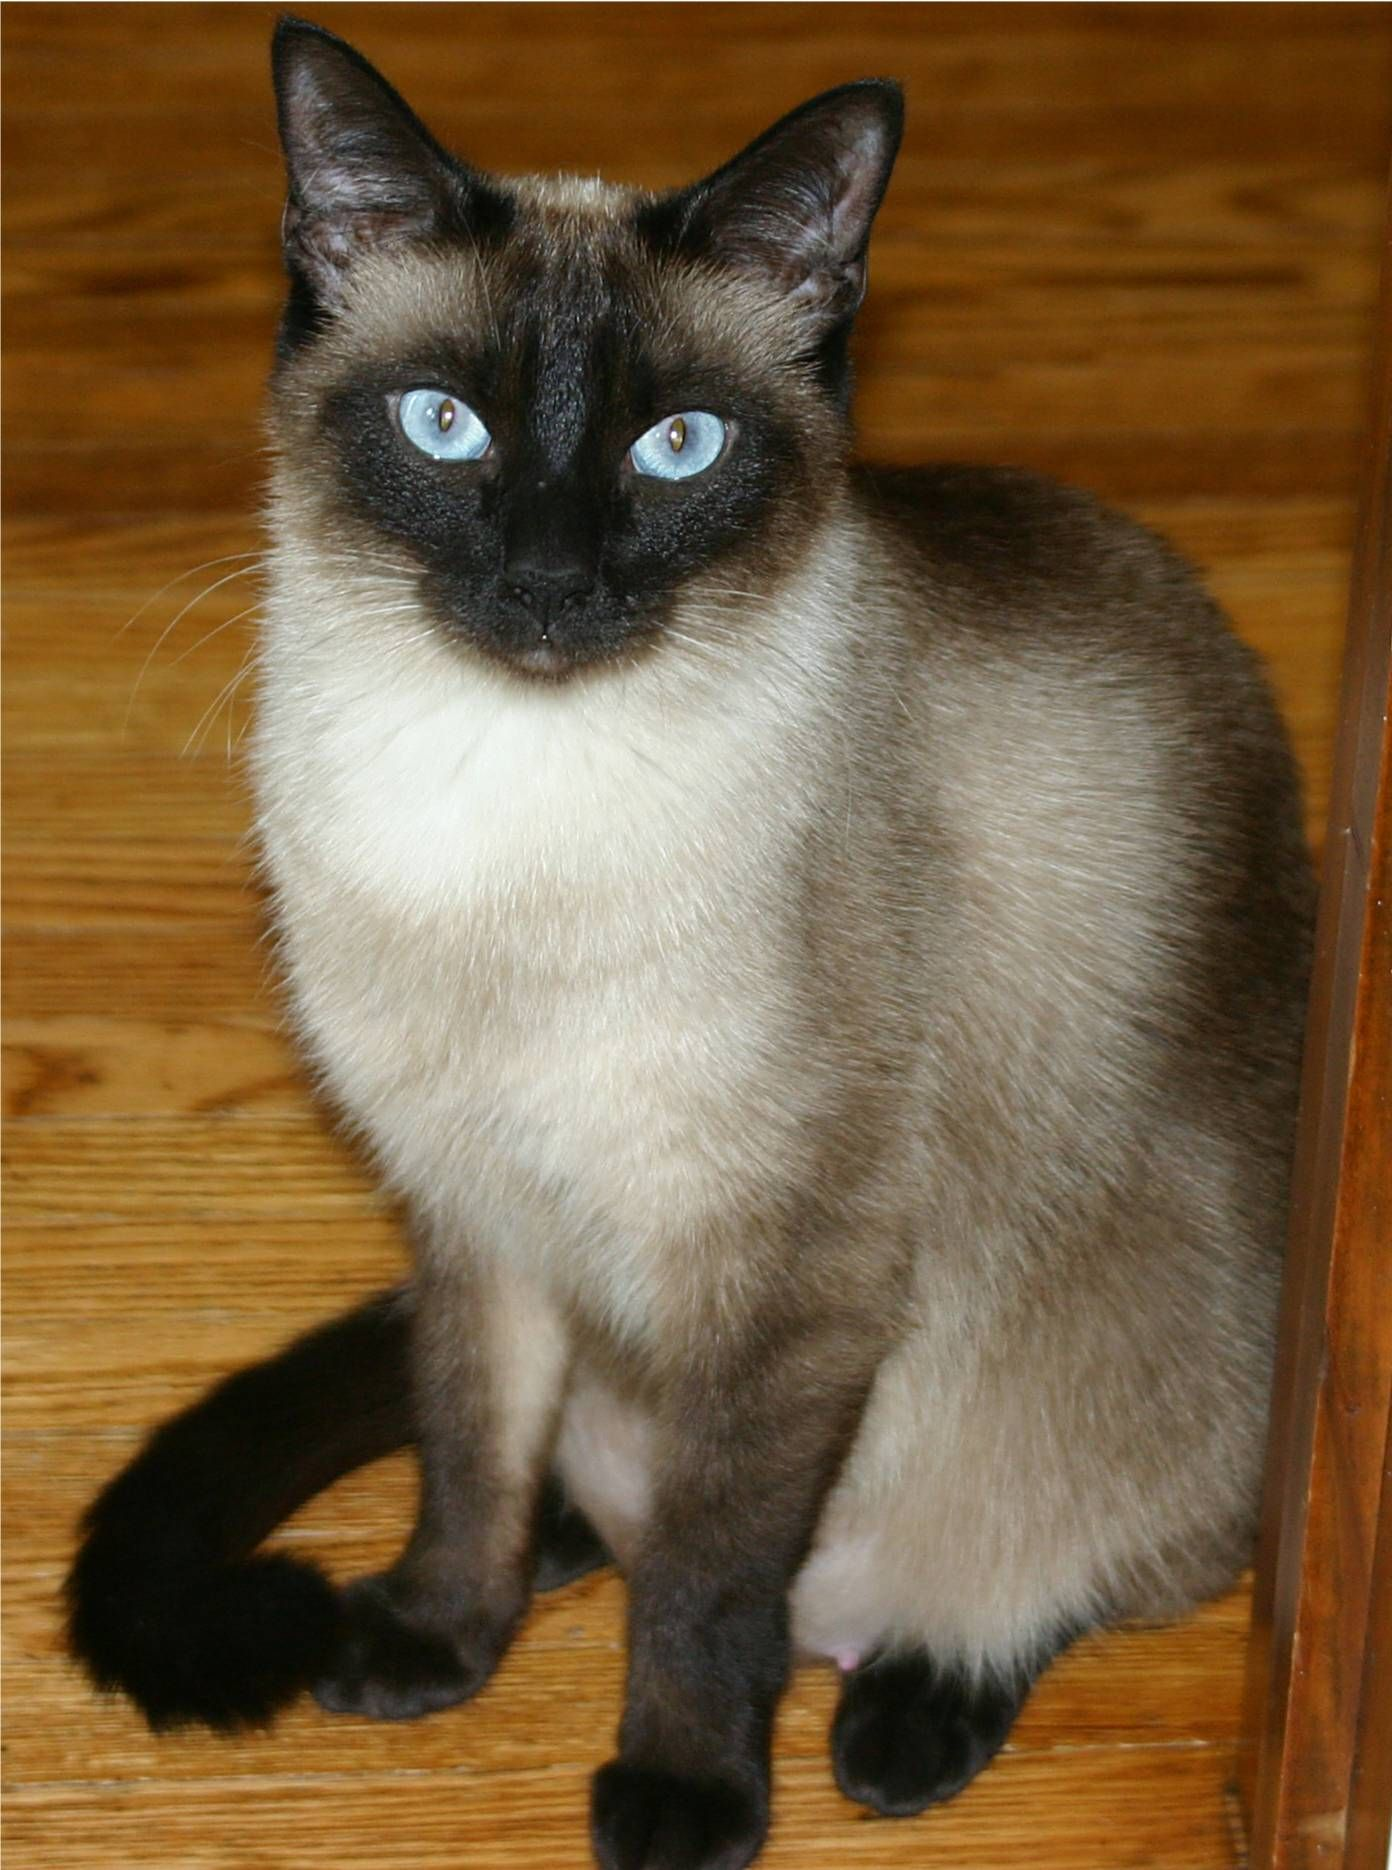 Cat Postcard Seal Point Blue Eyes Kitten Yarn Striped Background Vtg Mid Century Kittens Vintage Striped Background Kitten